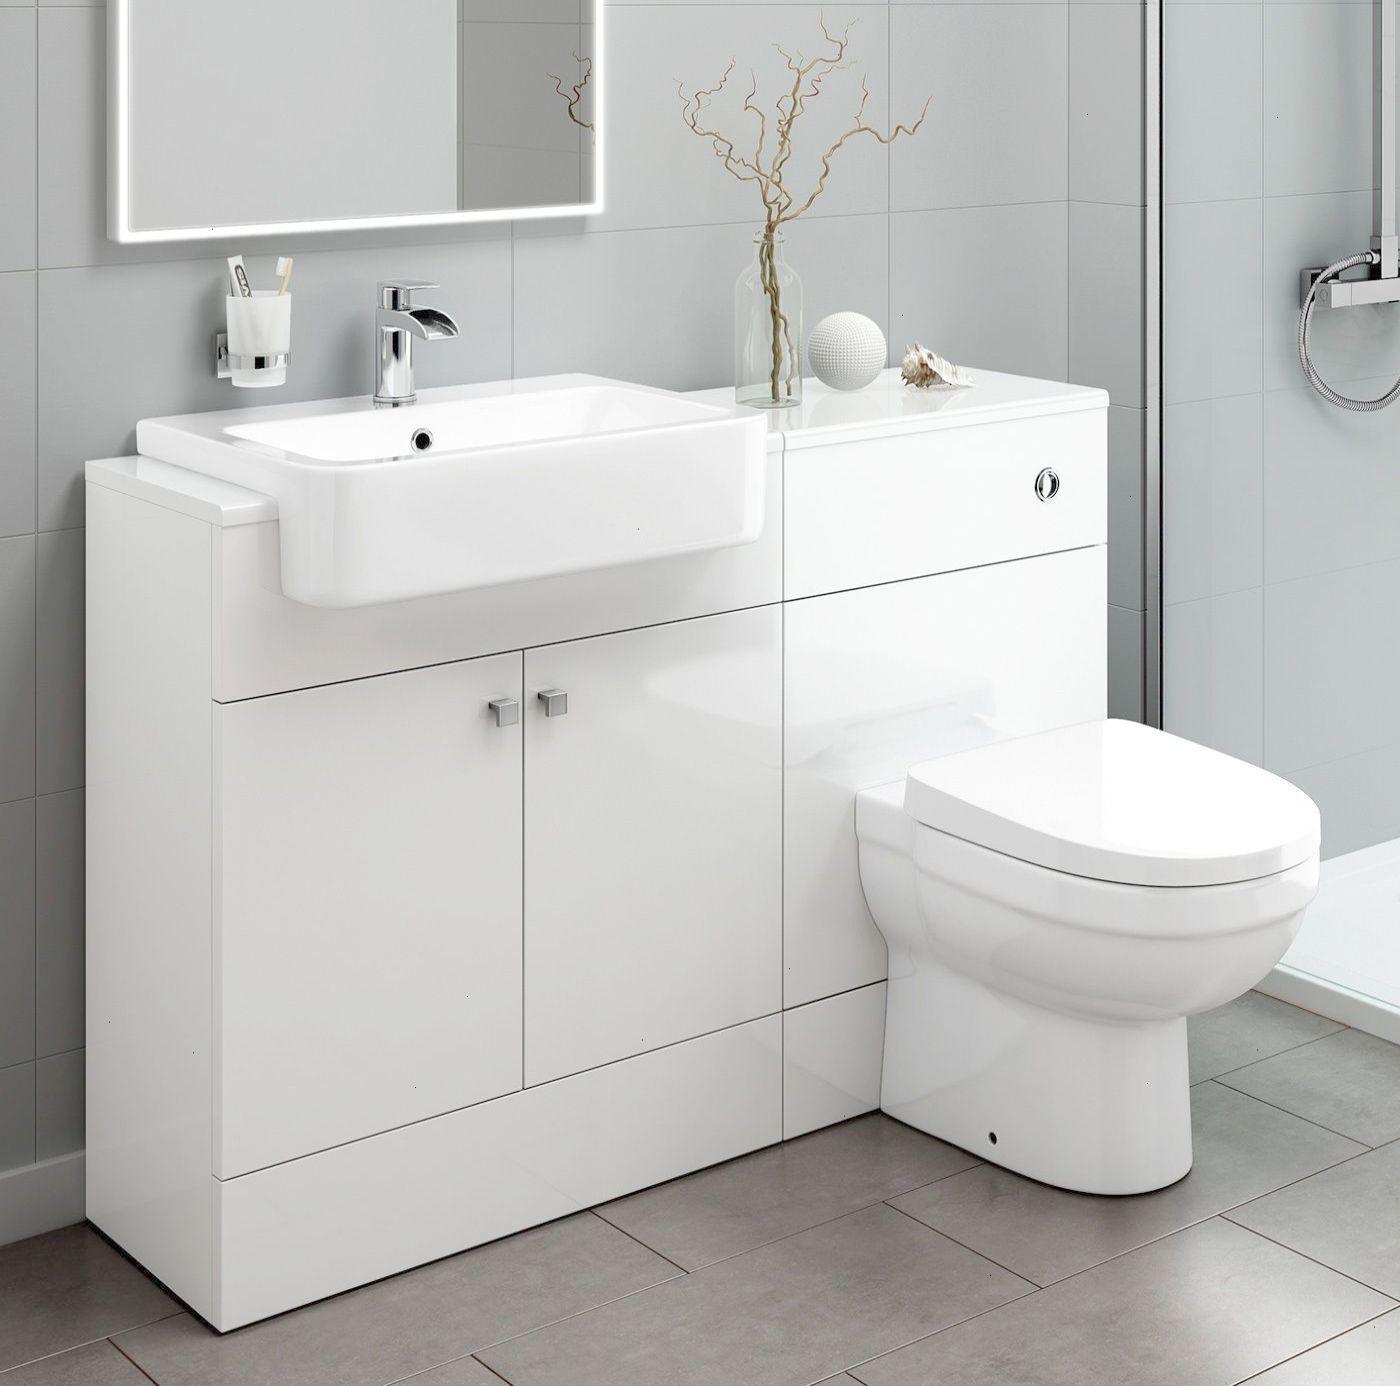 Magnificent >> Rustic Modern Bathroom Images #Super